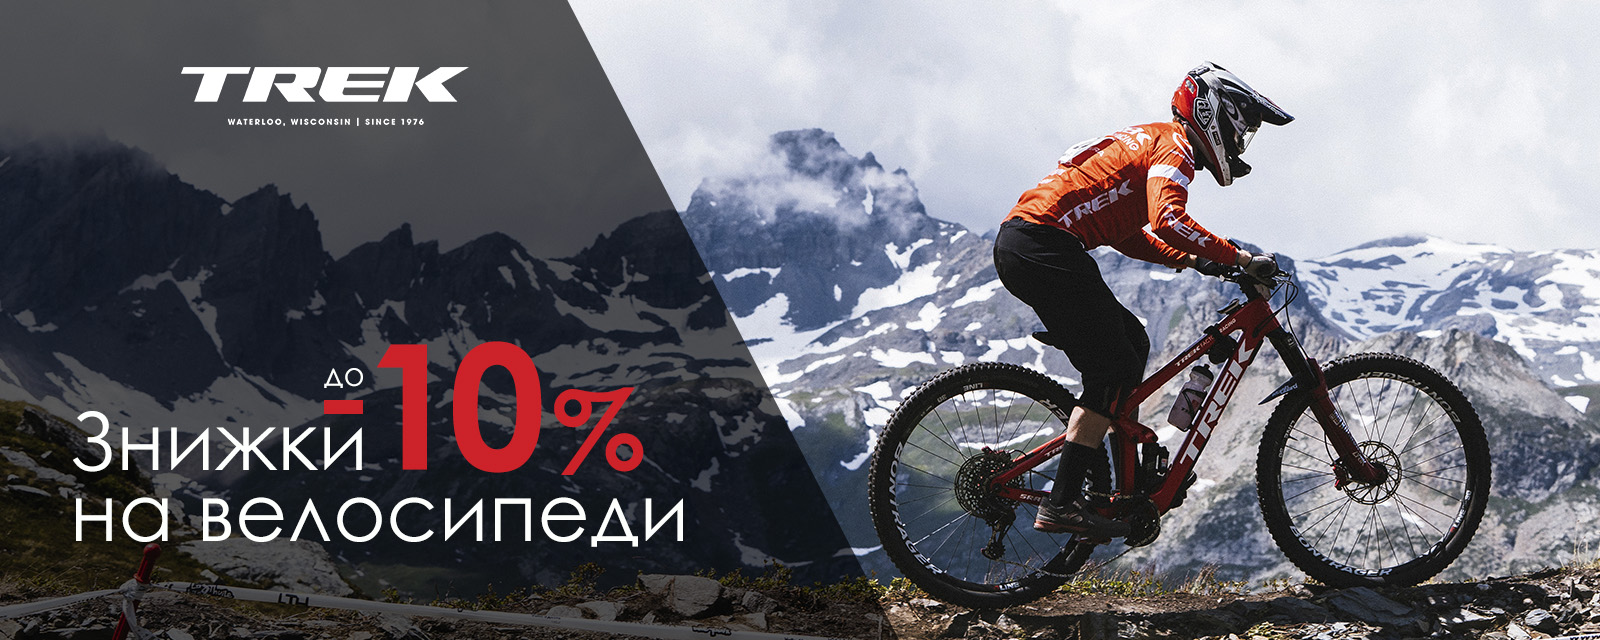 Акция!! Скидка на велосипед Trek 10%